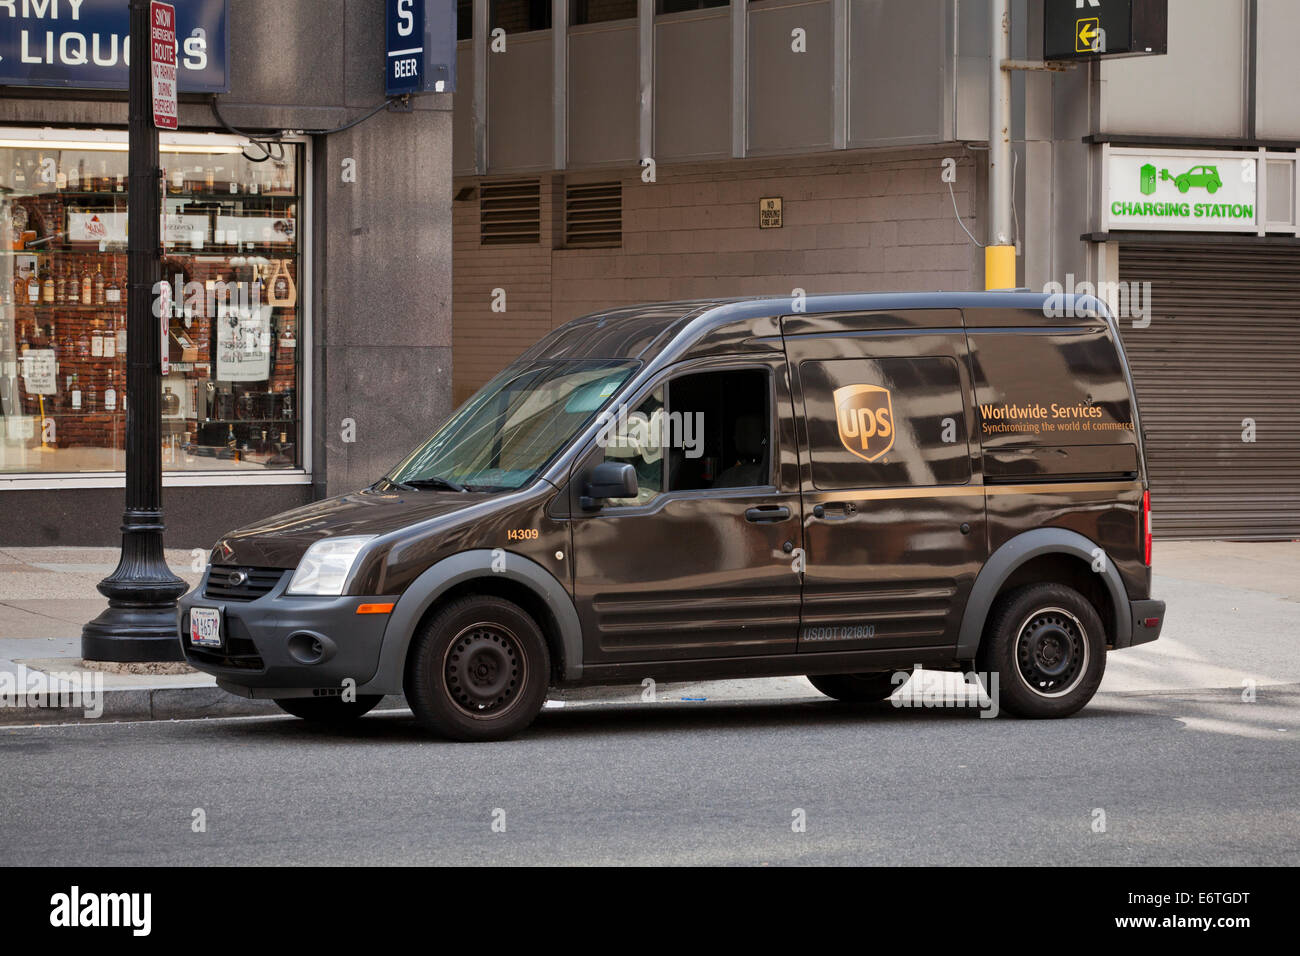 UPS delivery truck - Washington, DC USA Stock Photo